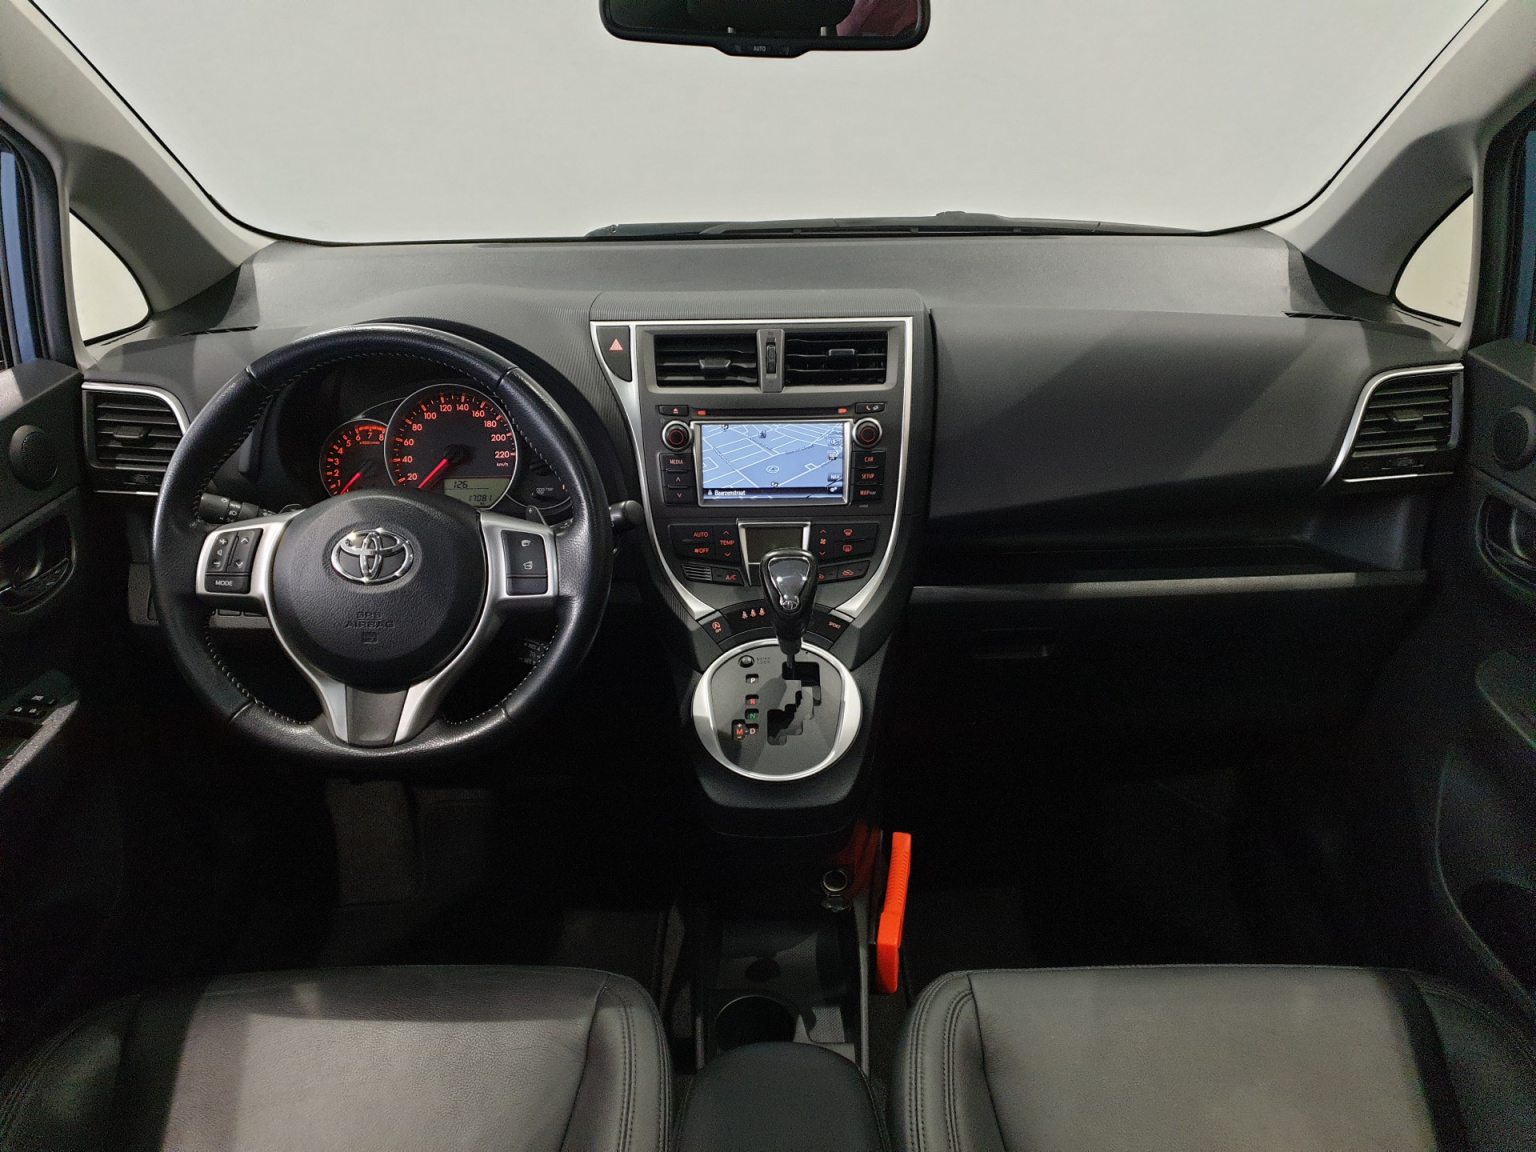 Toyota-Verso-S-15